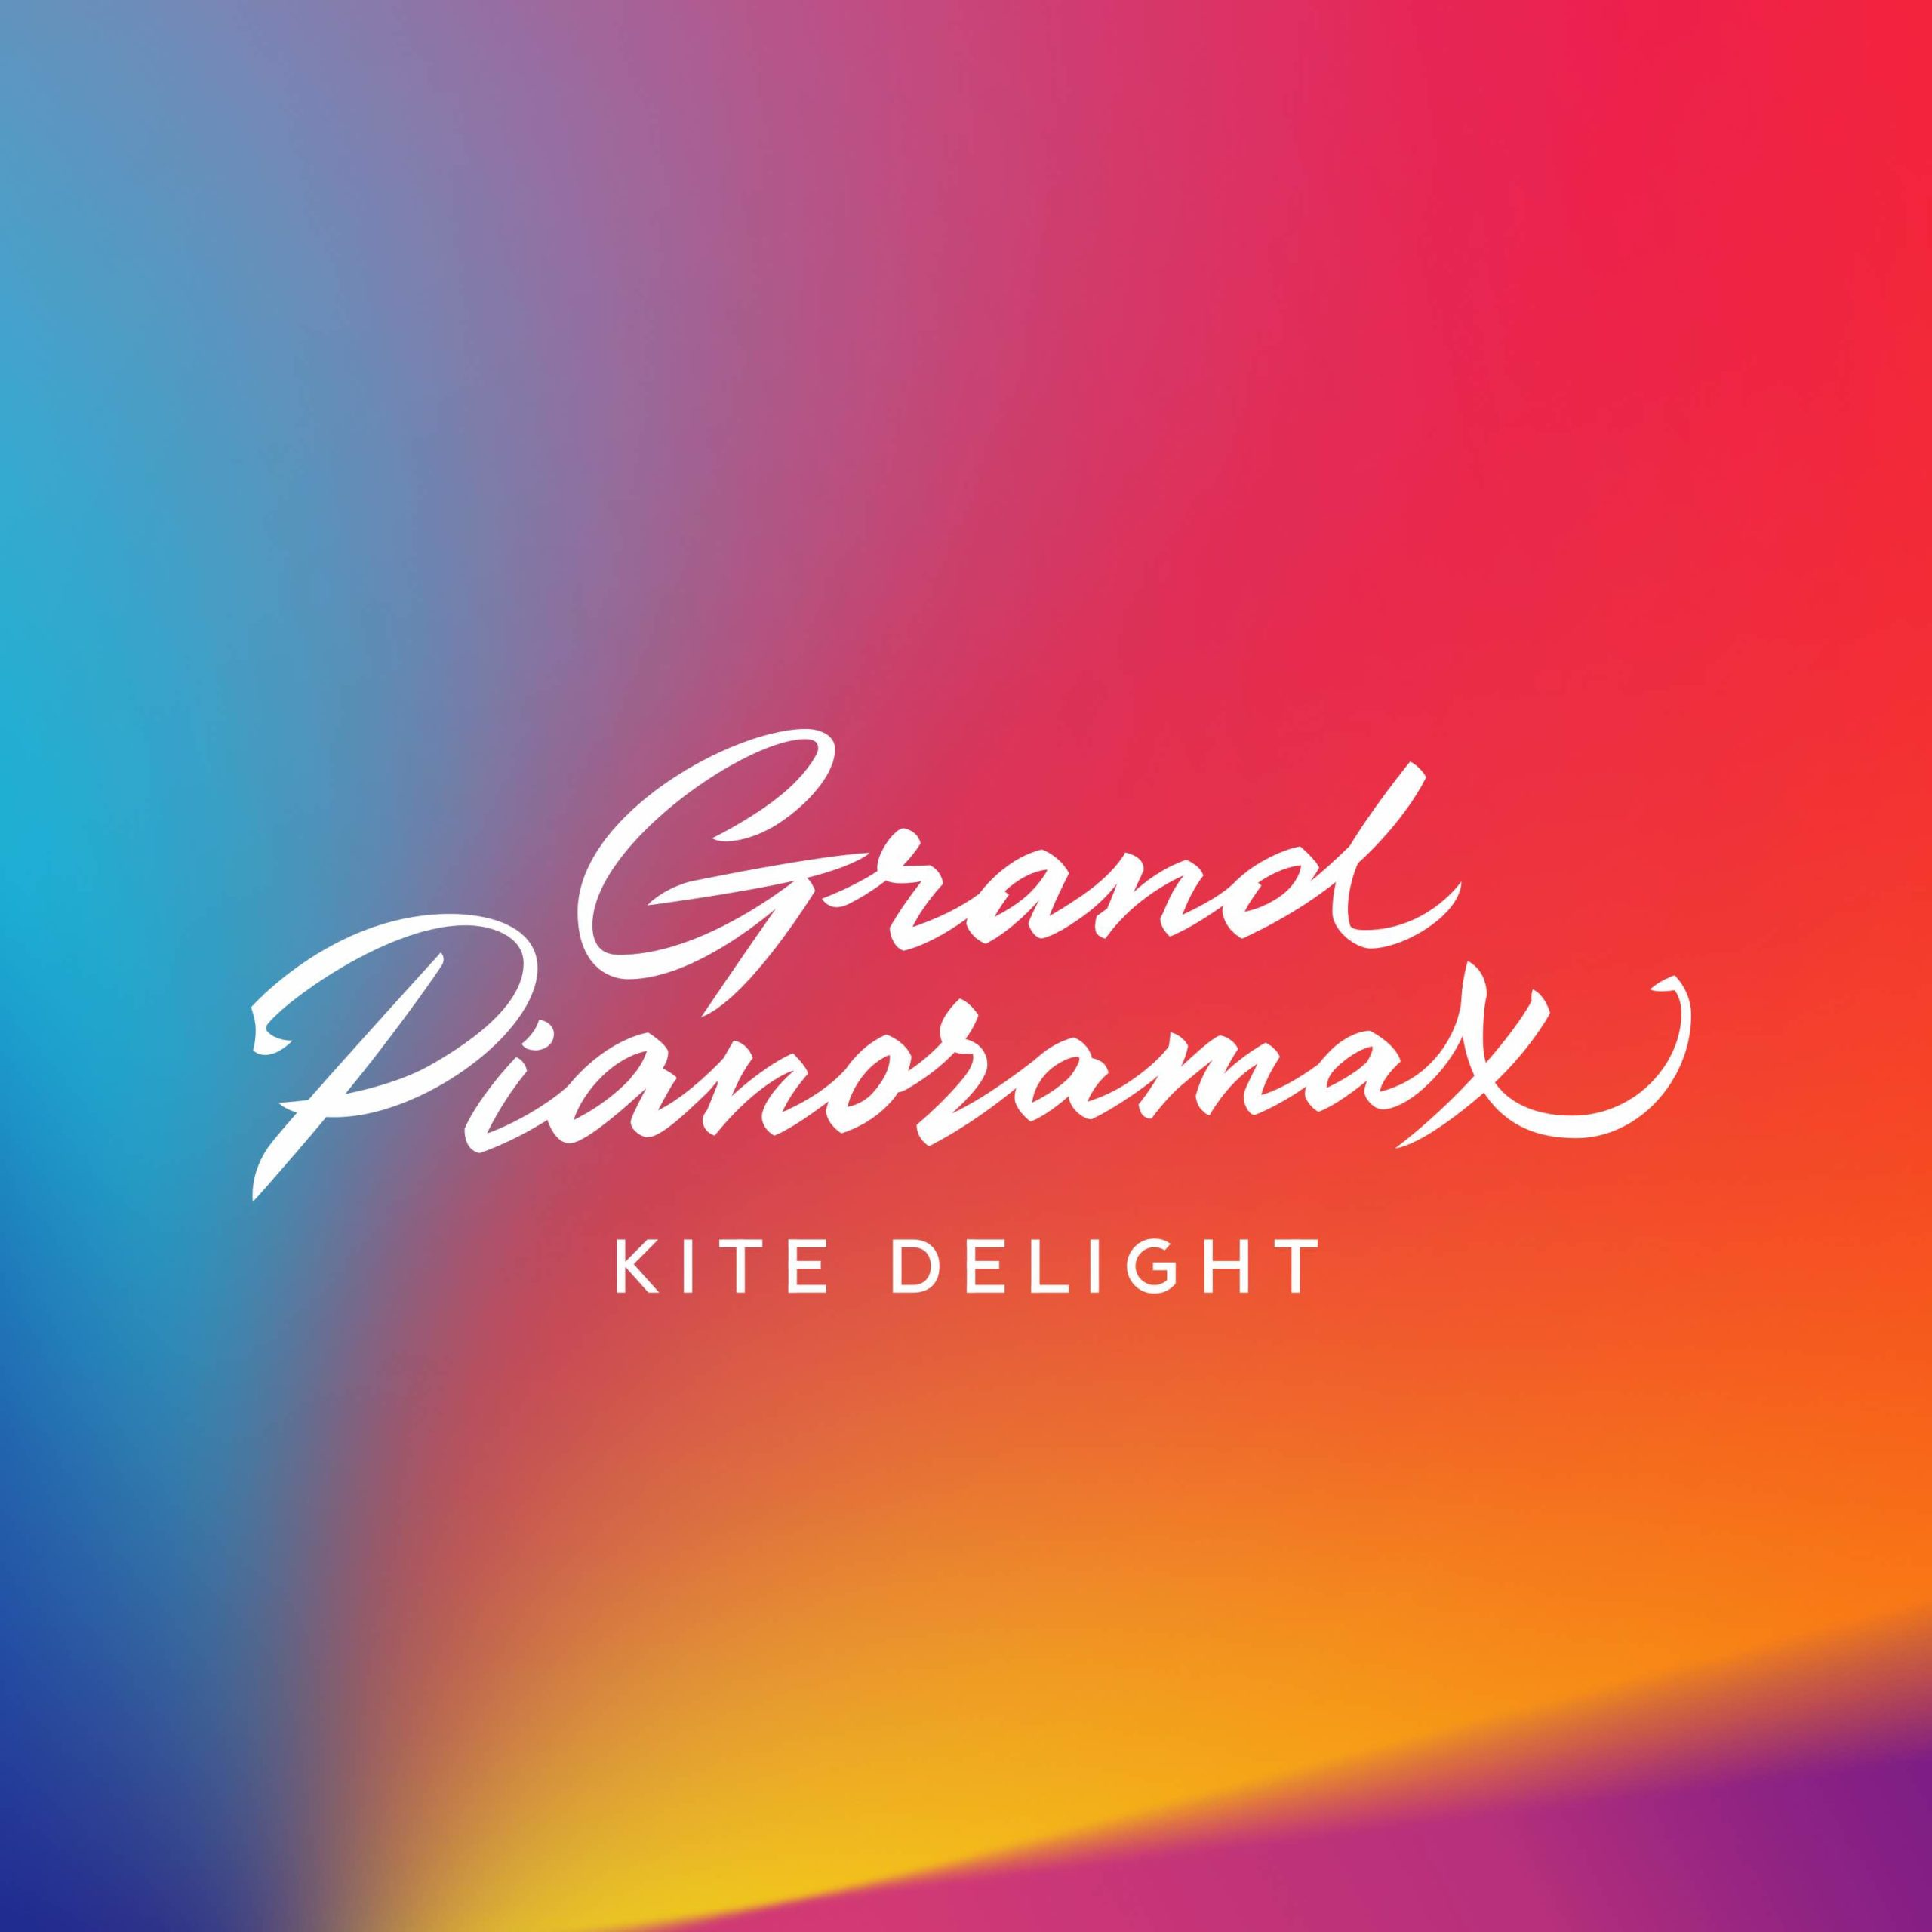 Kite Delight and more GPX delicacies